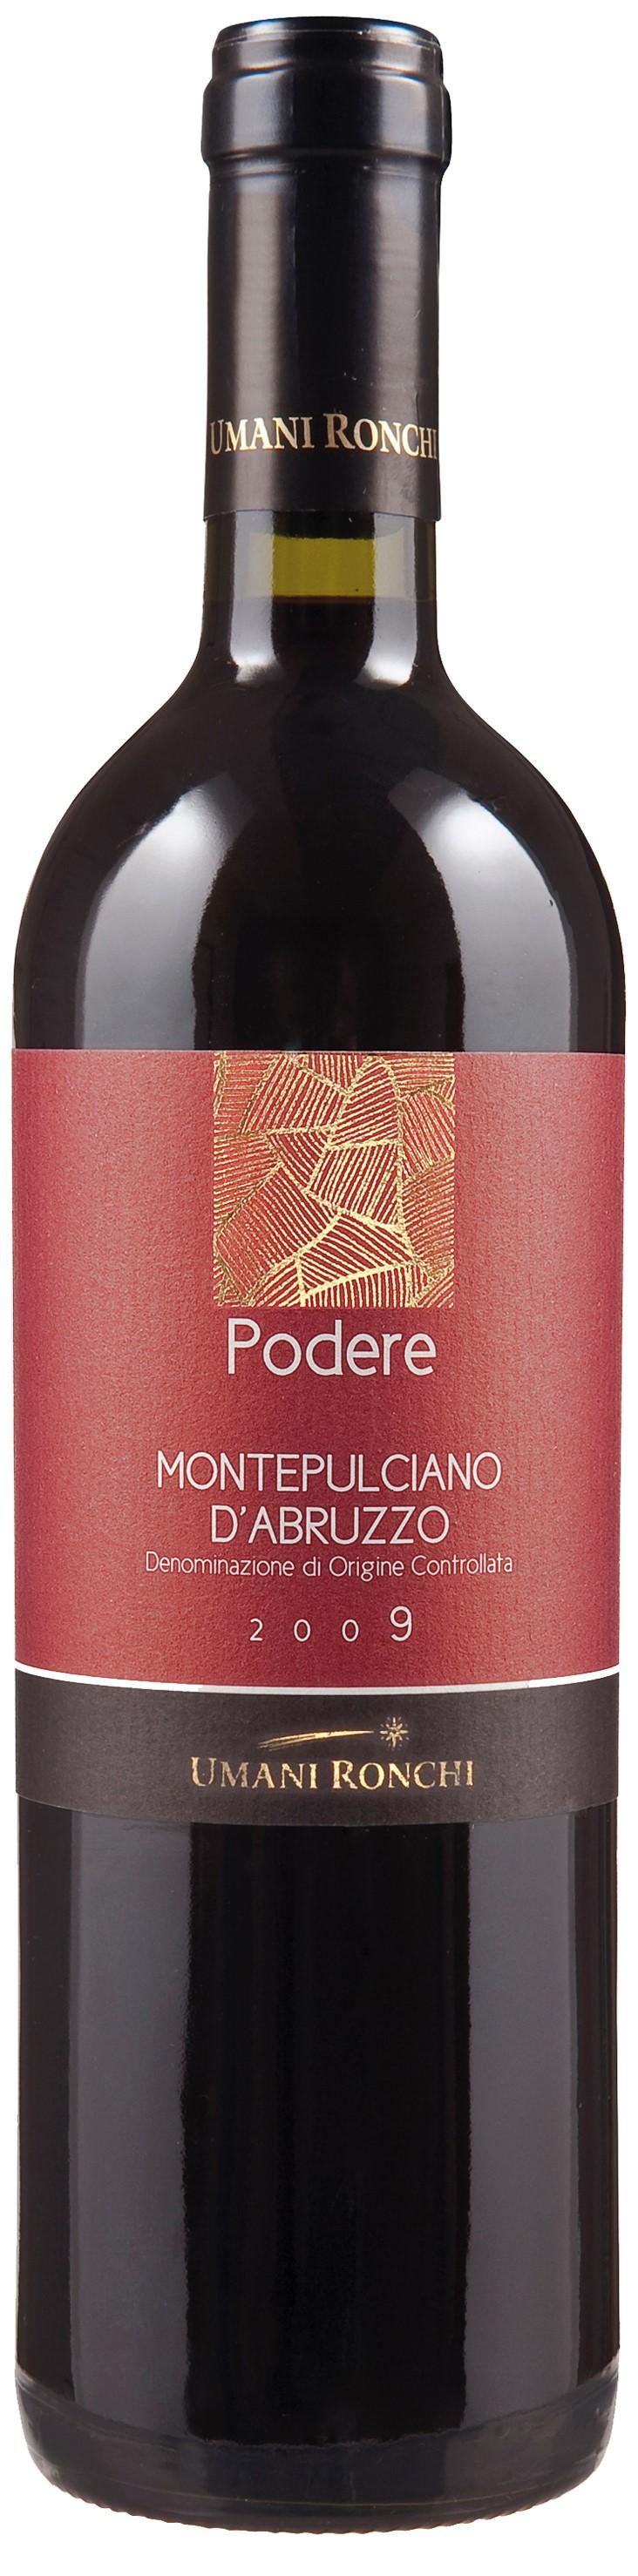 Umani Ronchi Montepulciano d'Abruzzo DOP Magnumflasche